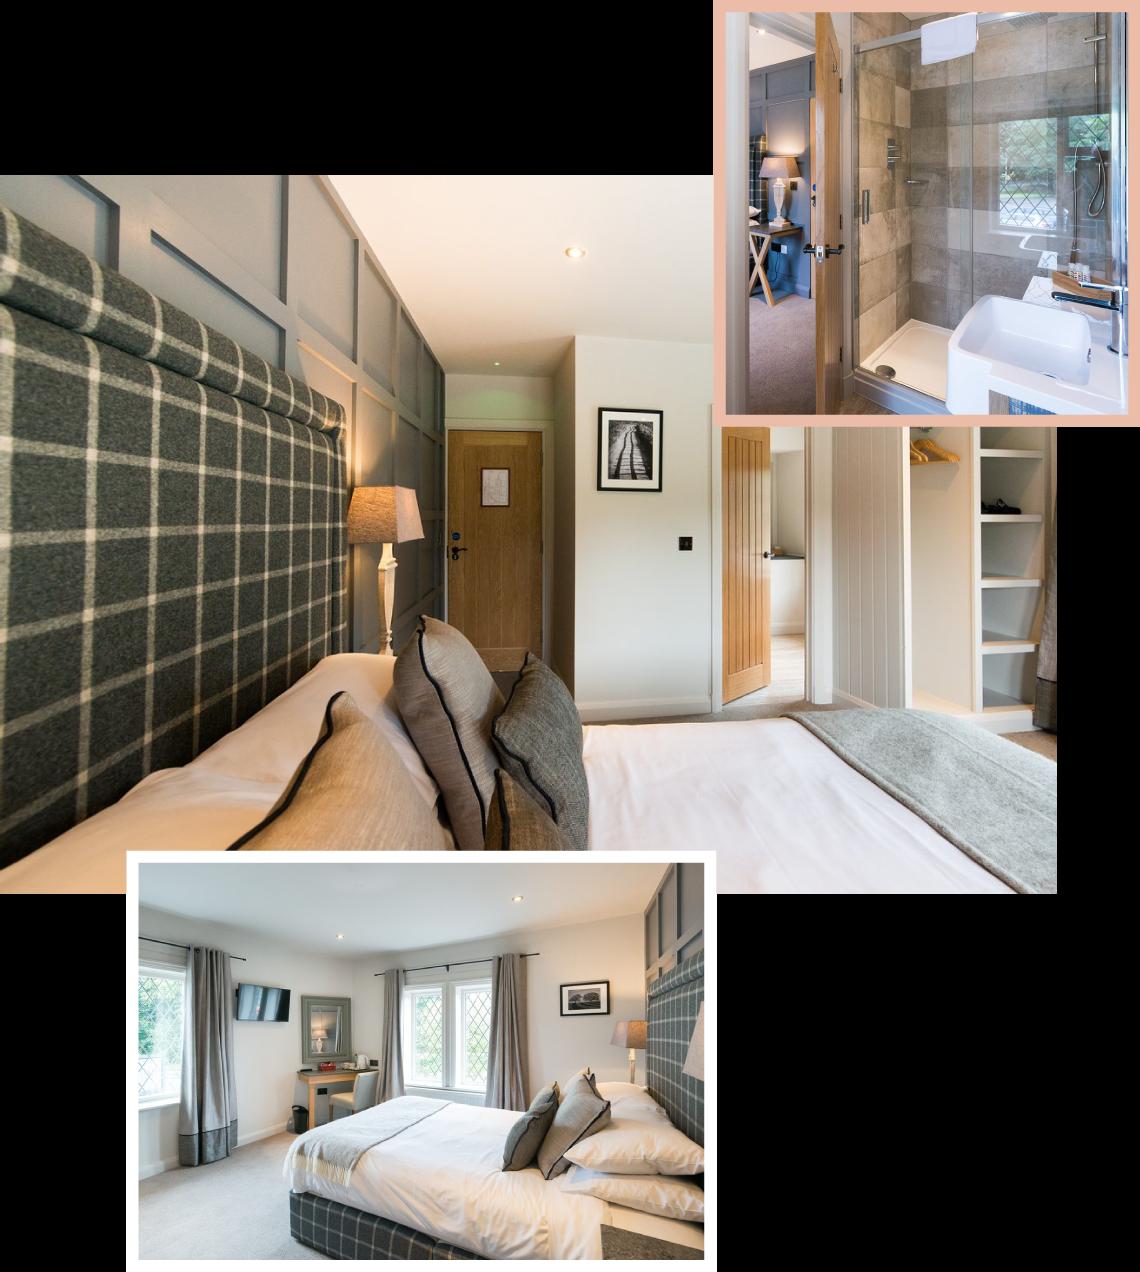 homepage-rooms-image